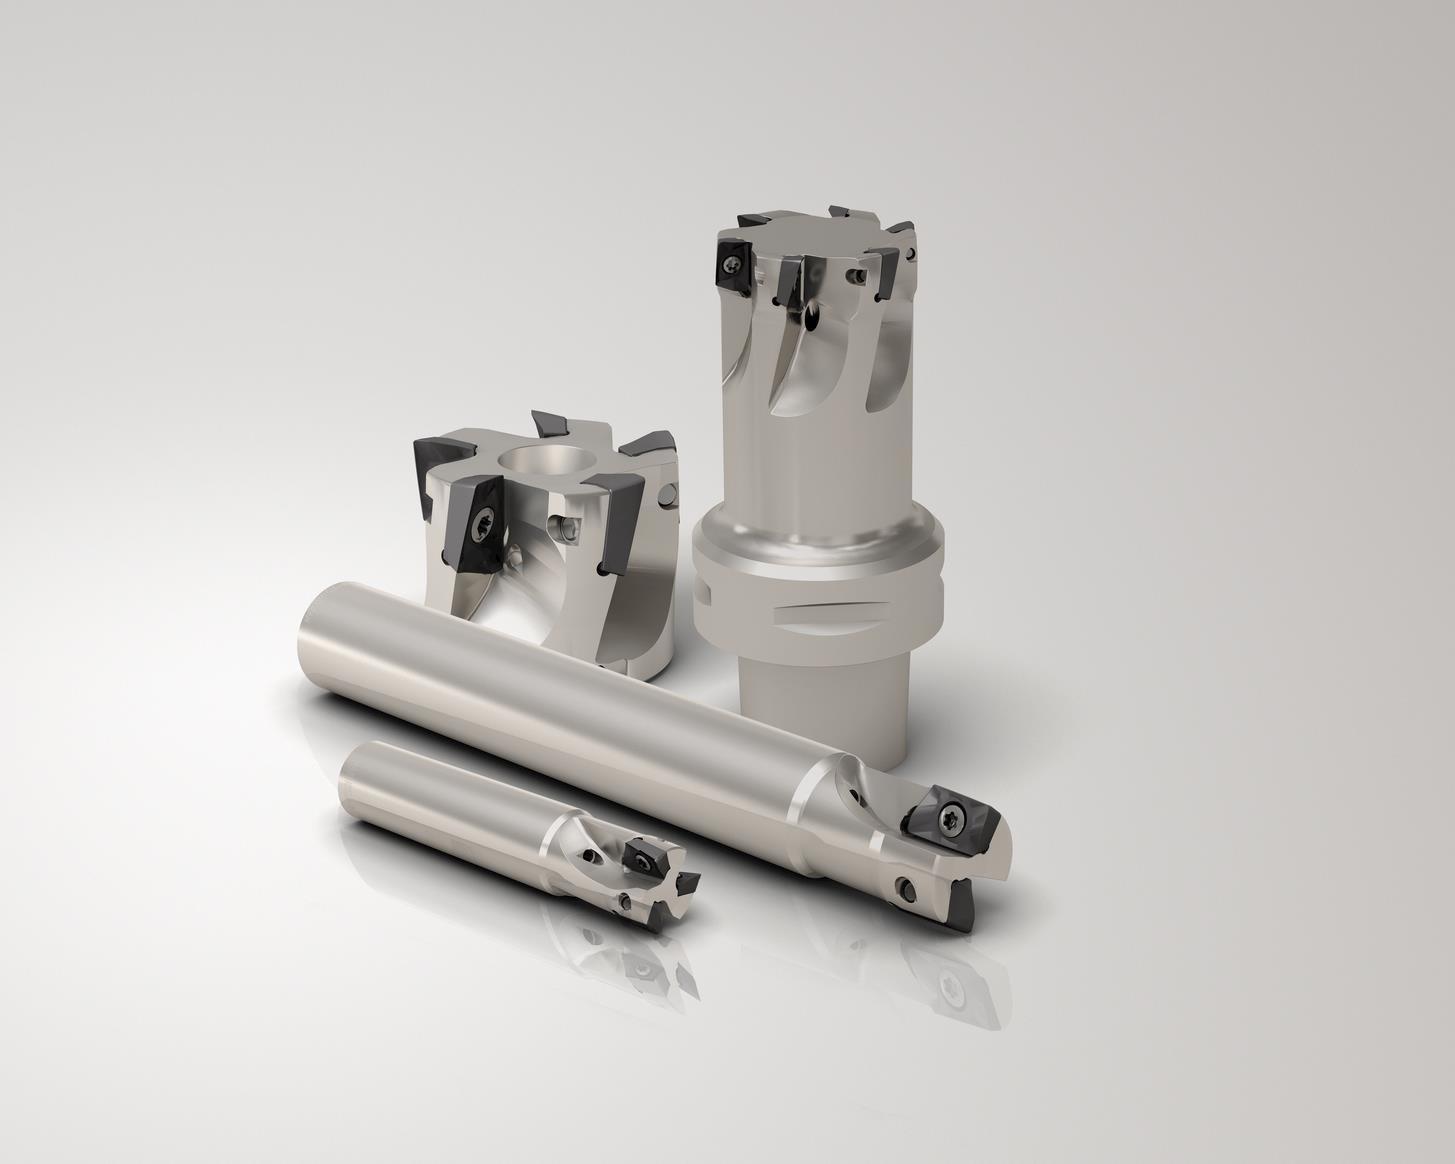 Turbo - 2-Cutting-Edge Single-Sided Inserts